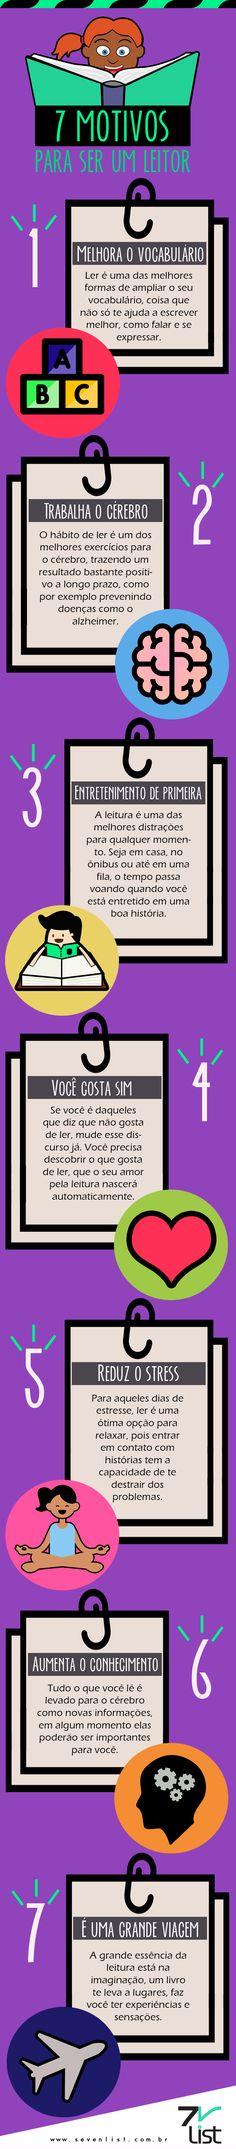 Infográfico - Livros/ ler/ leitura.